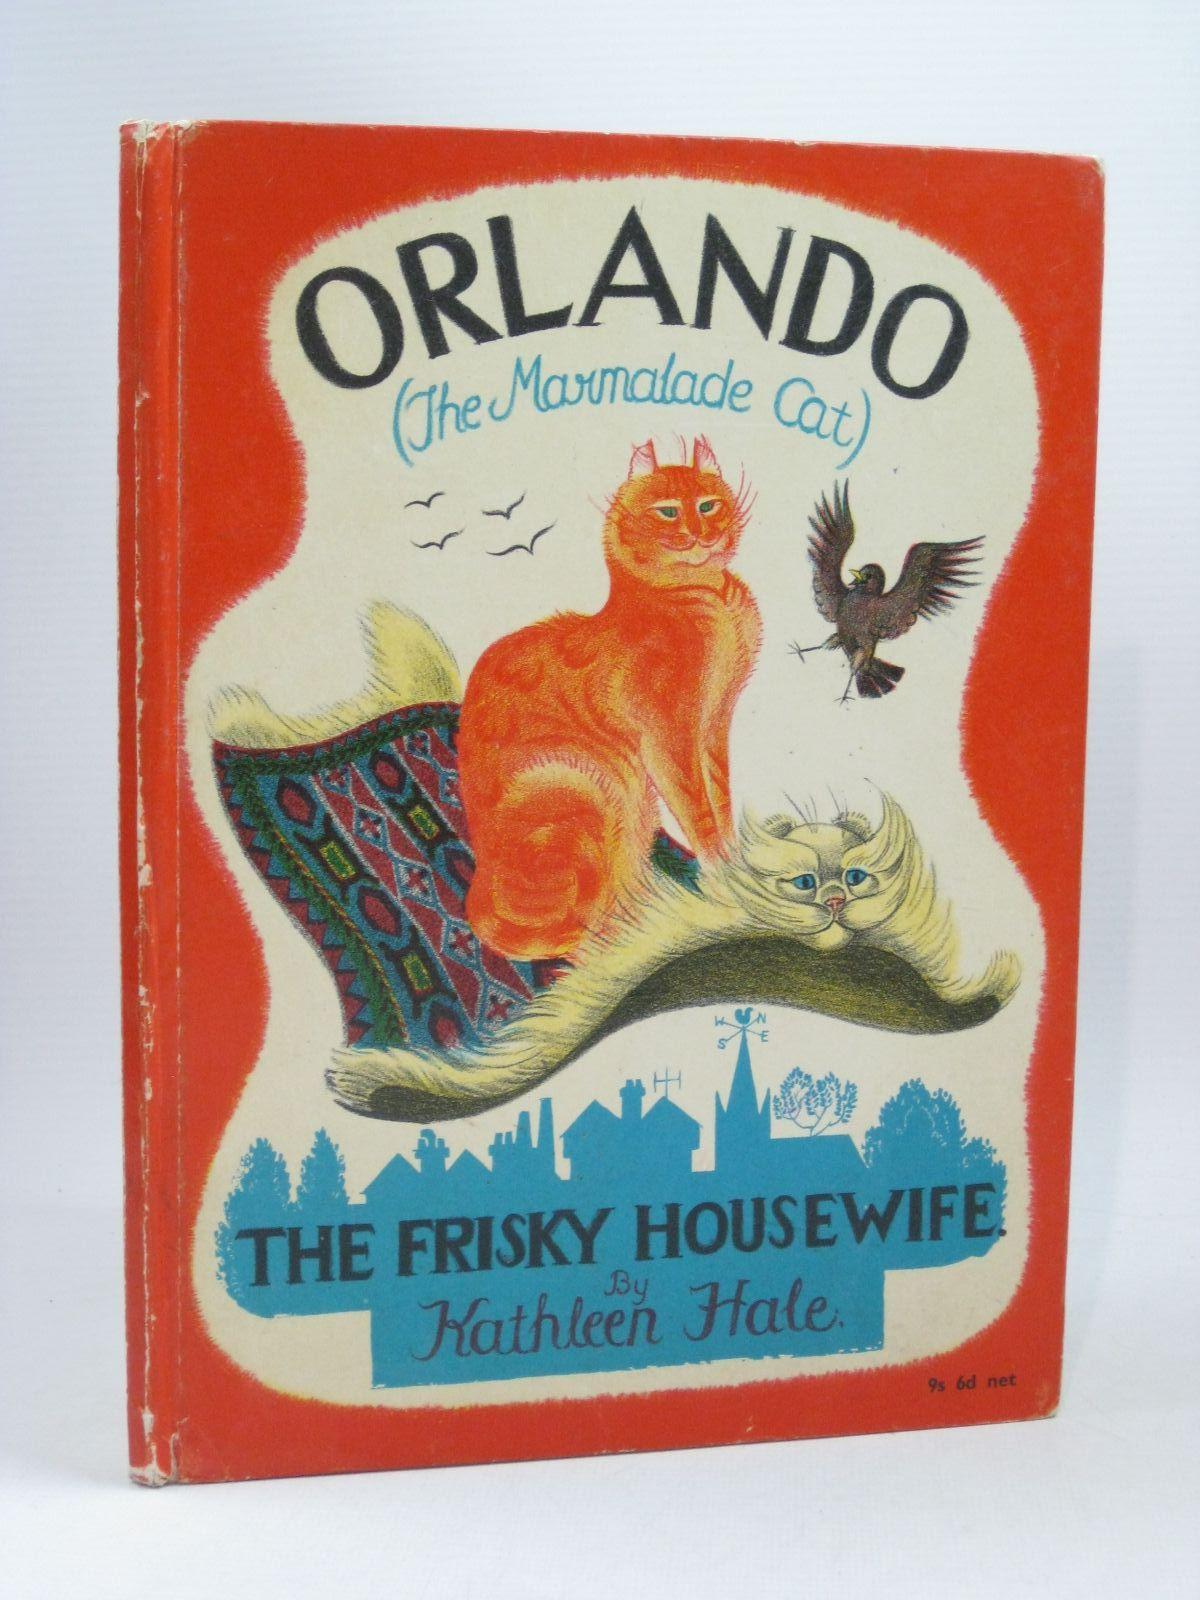 Photo of ORLANDO (THE MARMALADE CAT) THE FRISKY HOUSEWIFE